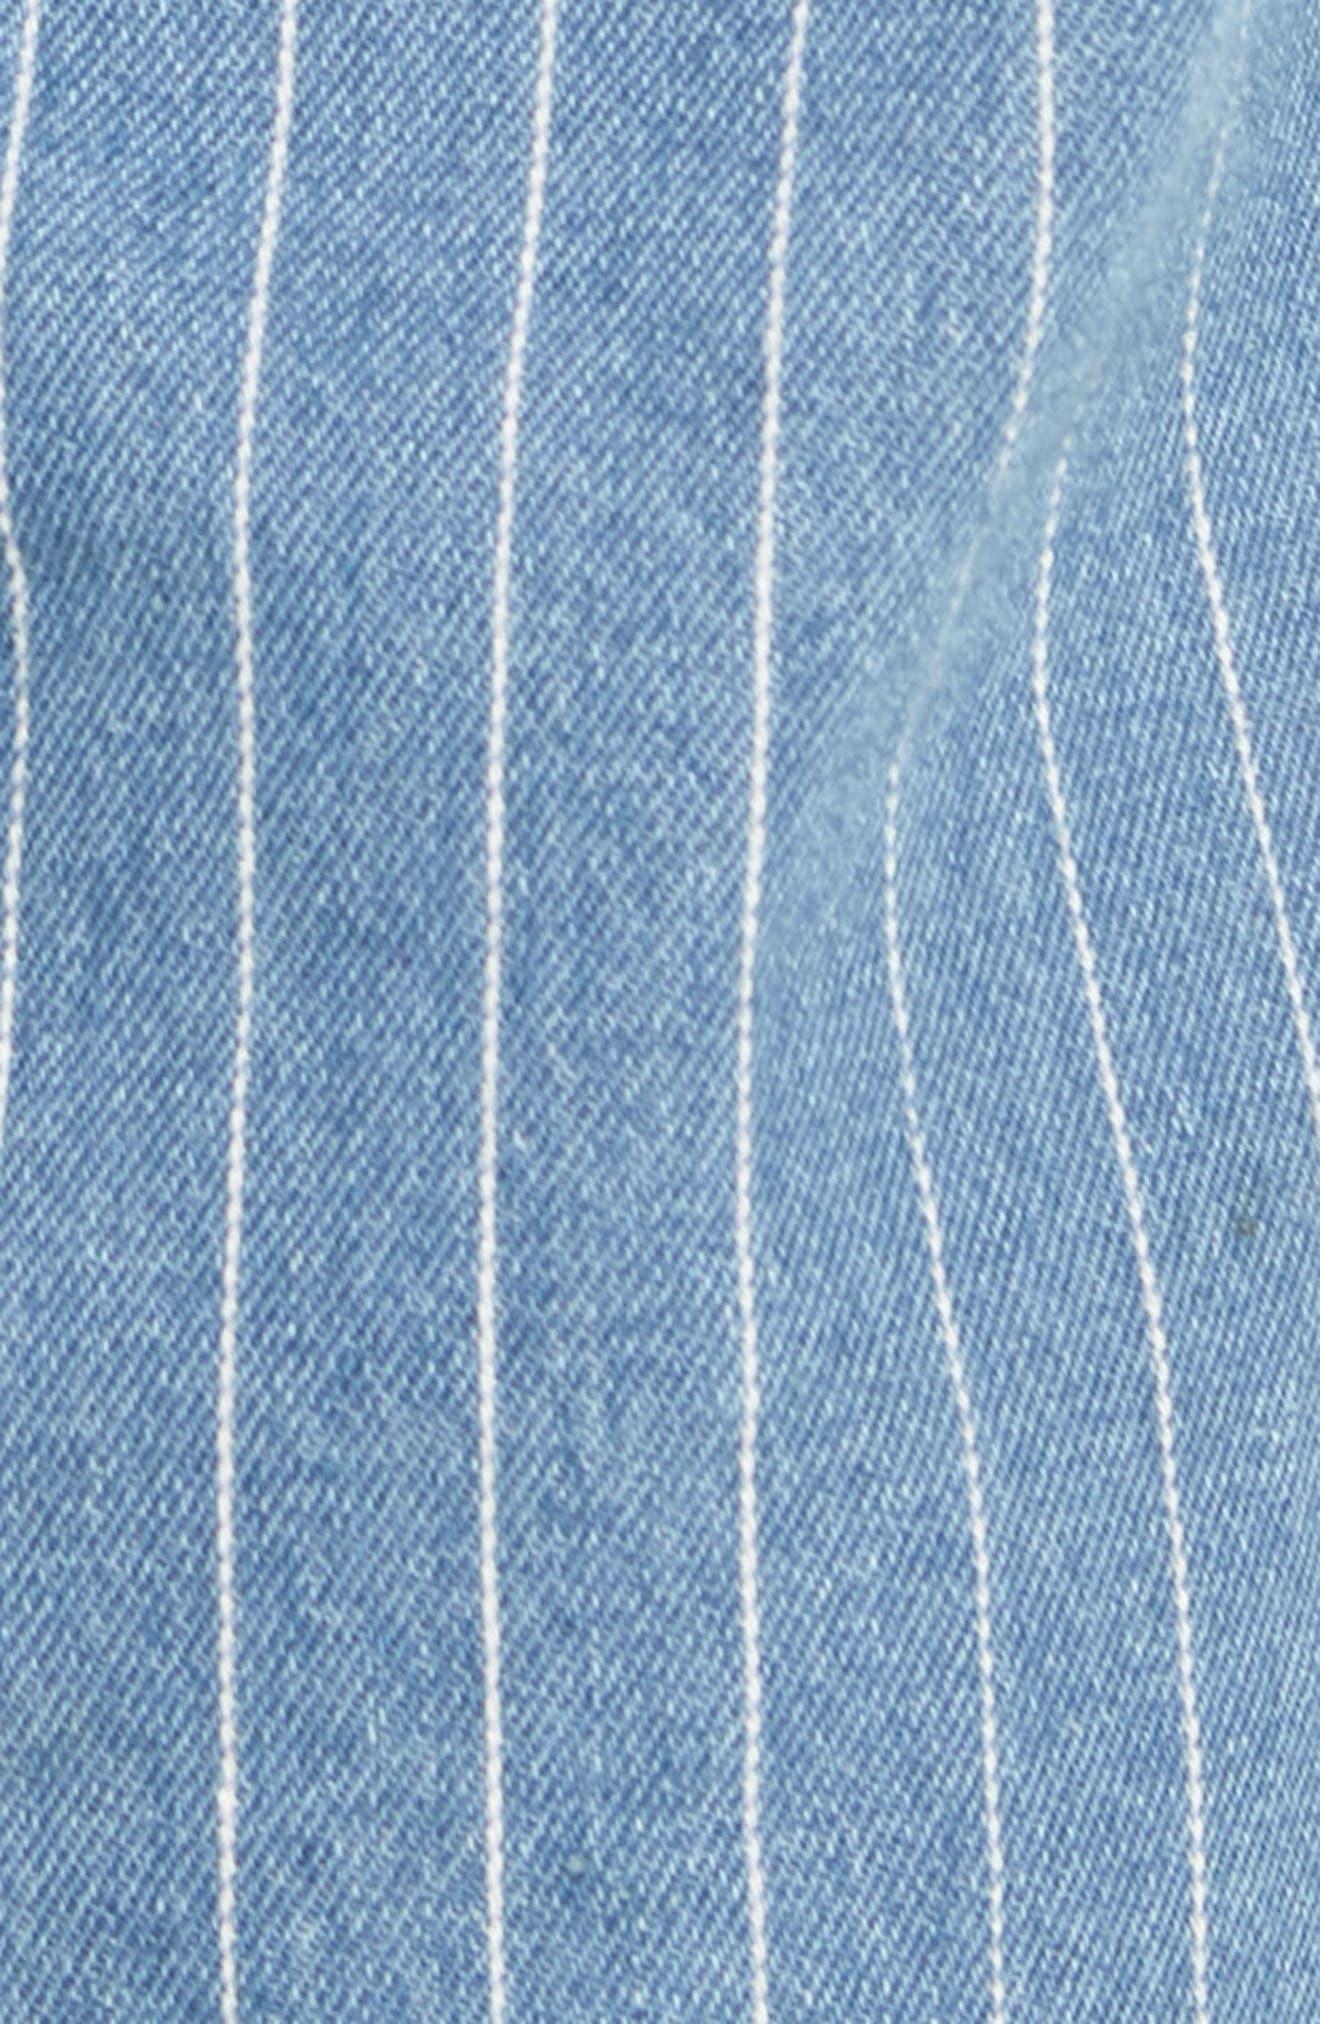 B. Relaxed Jeans,                             Alternate thumbnail 5, color,                             Stripe Denim Crop